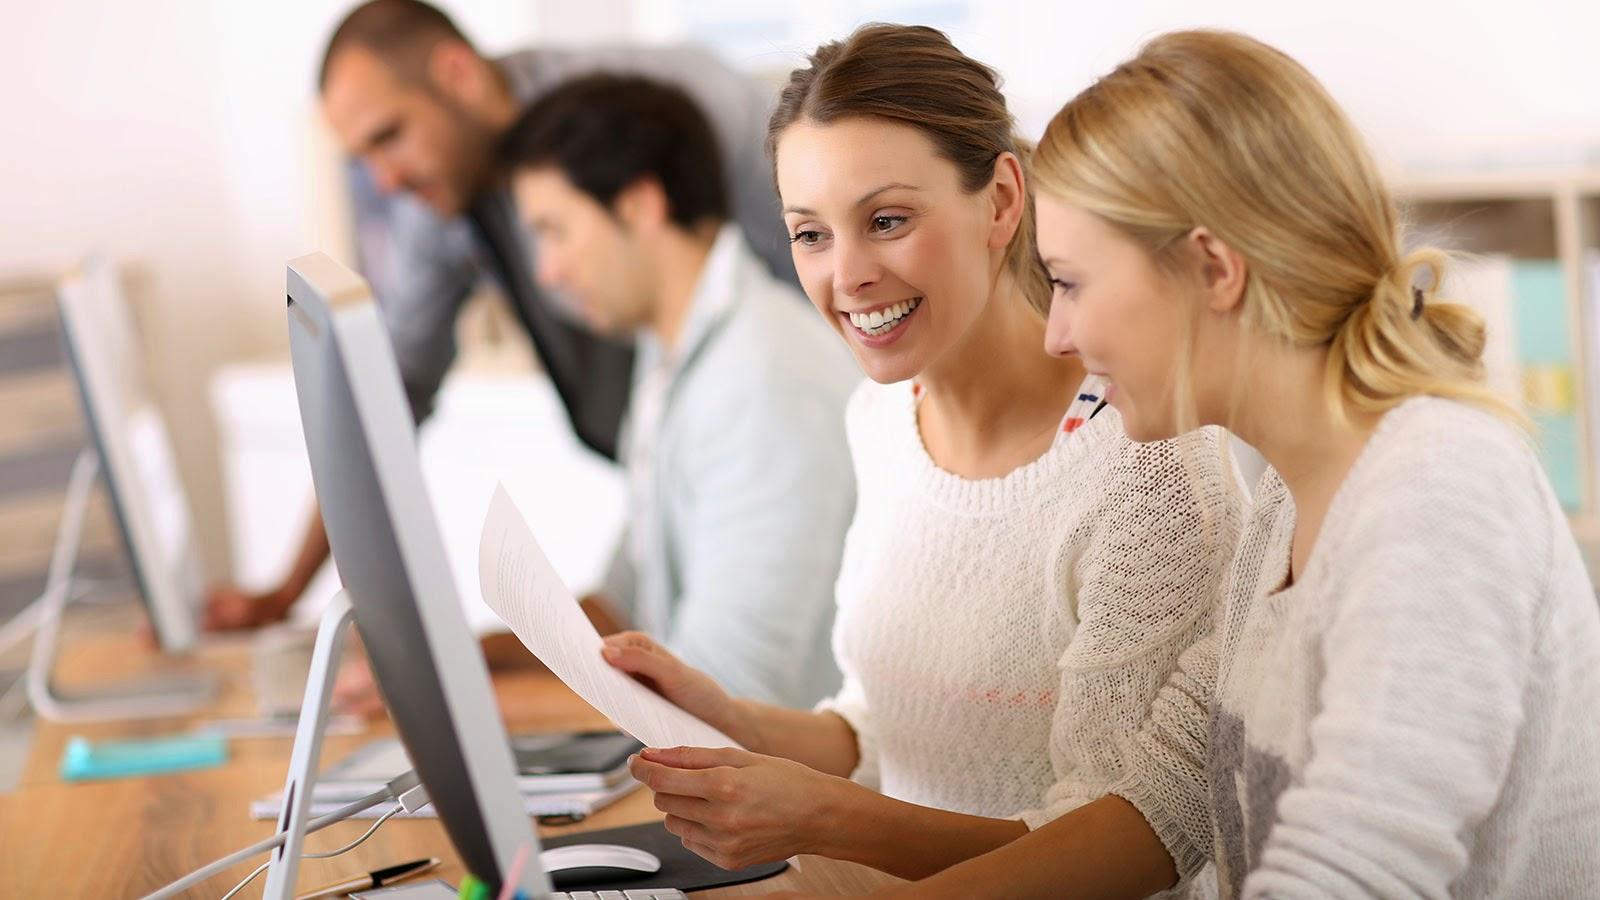 022 Essay Writing Services Australia Slid Stupendous Online Professional Uk Good Service Reddit Admission Reviews Full